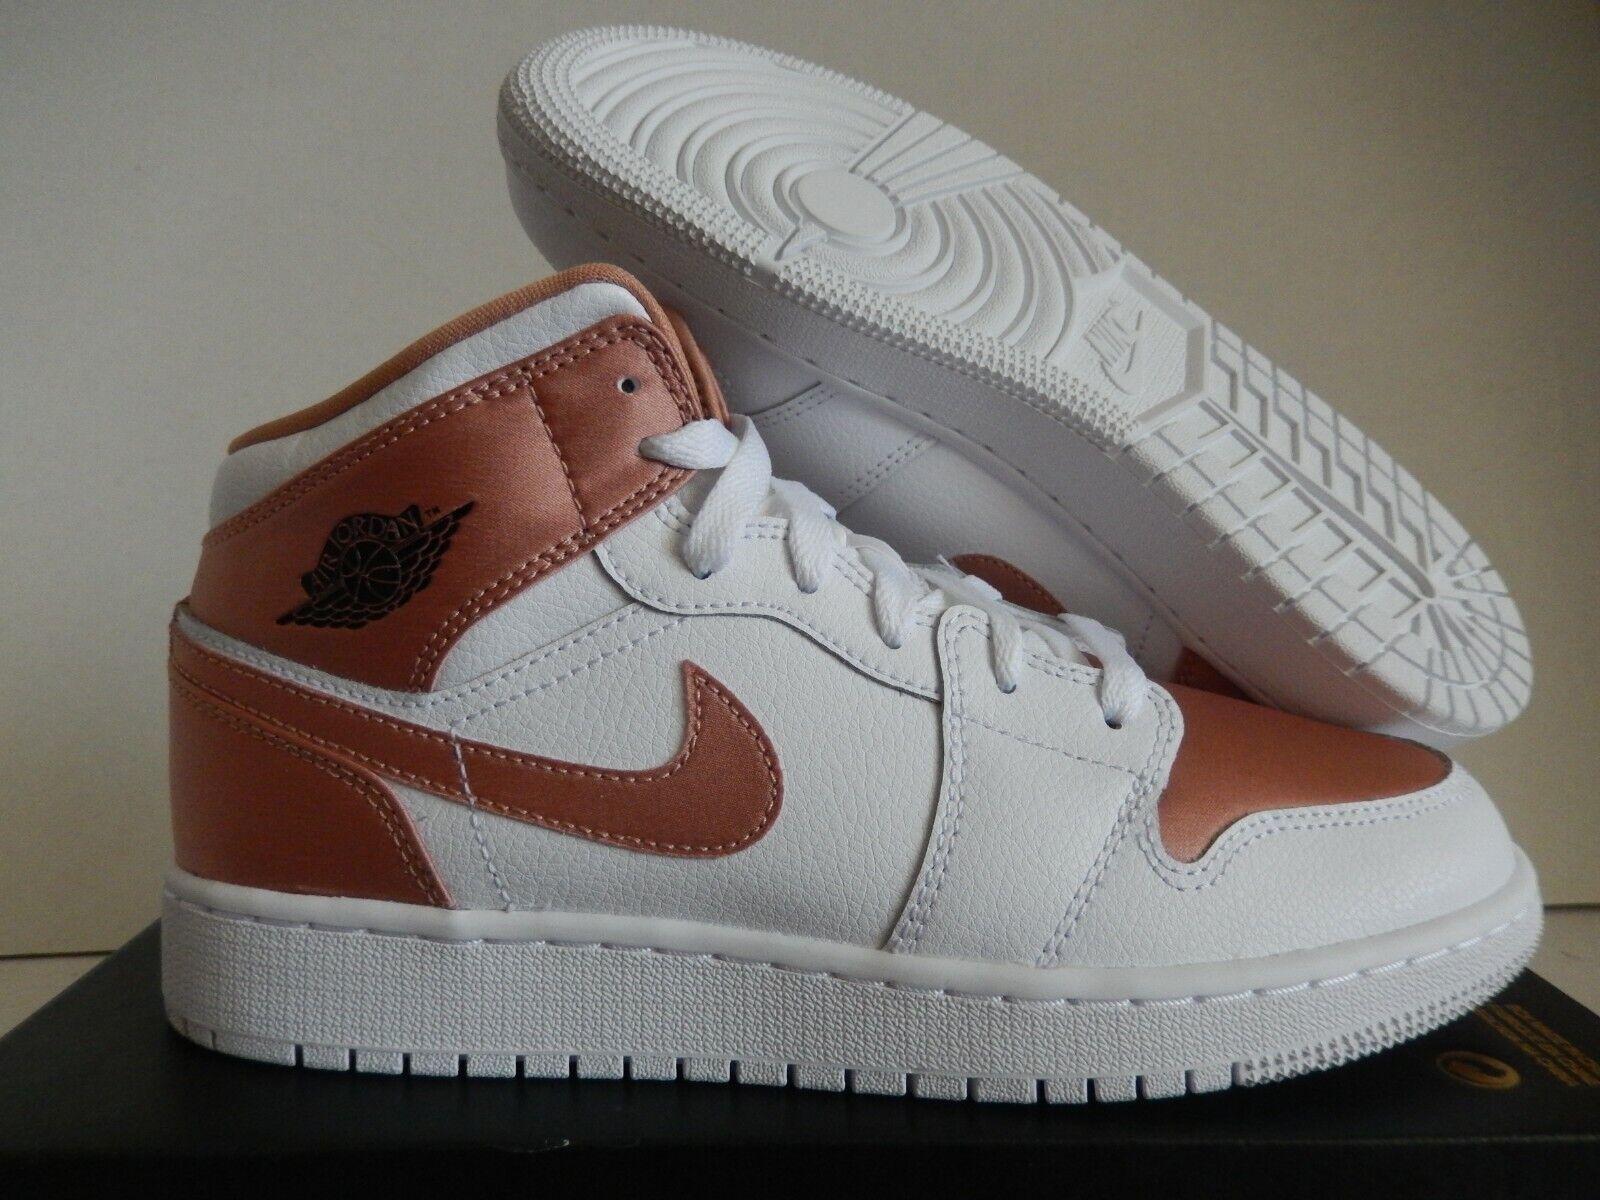 Nike Air Jordan Retro 1 Mid Rose Gold White 555112-190 GS 7y Youth ...